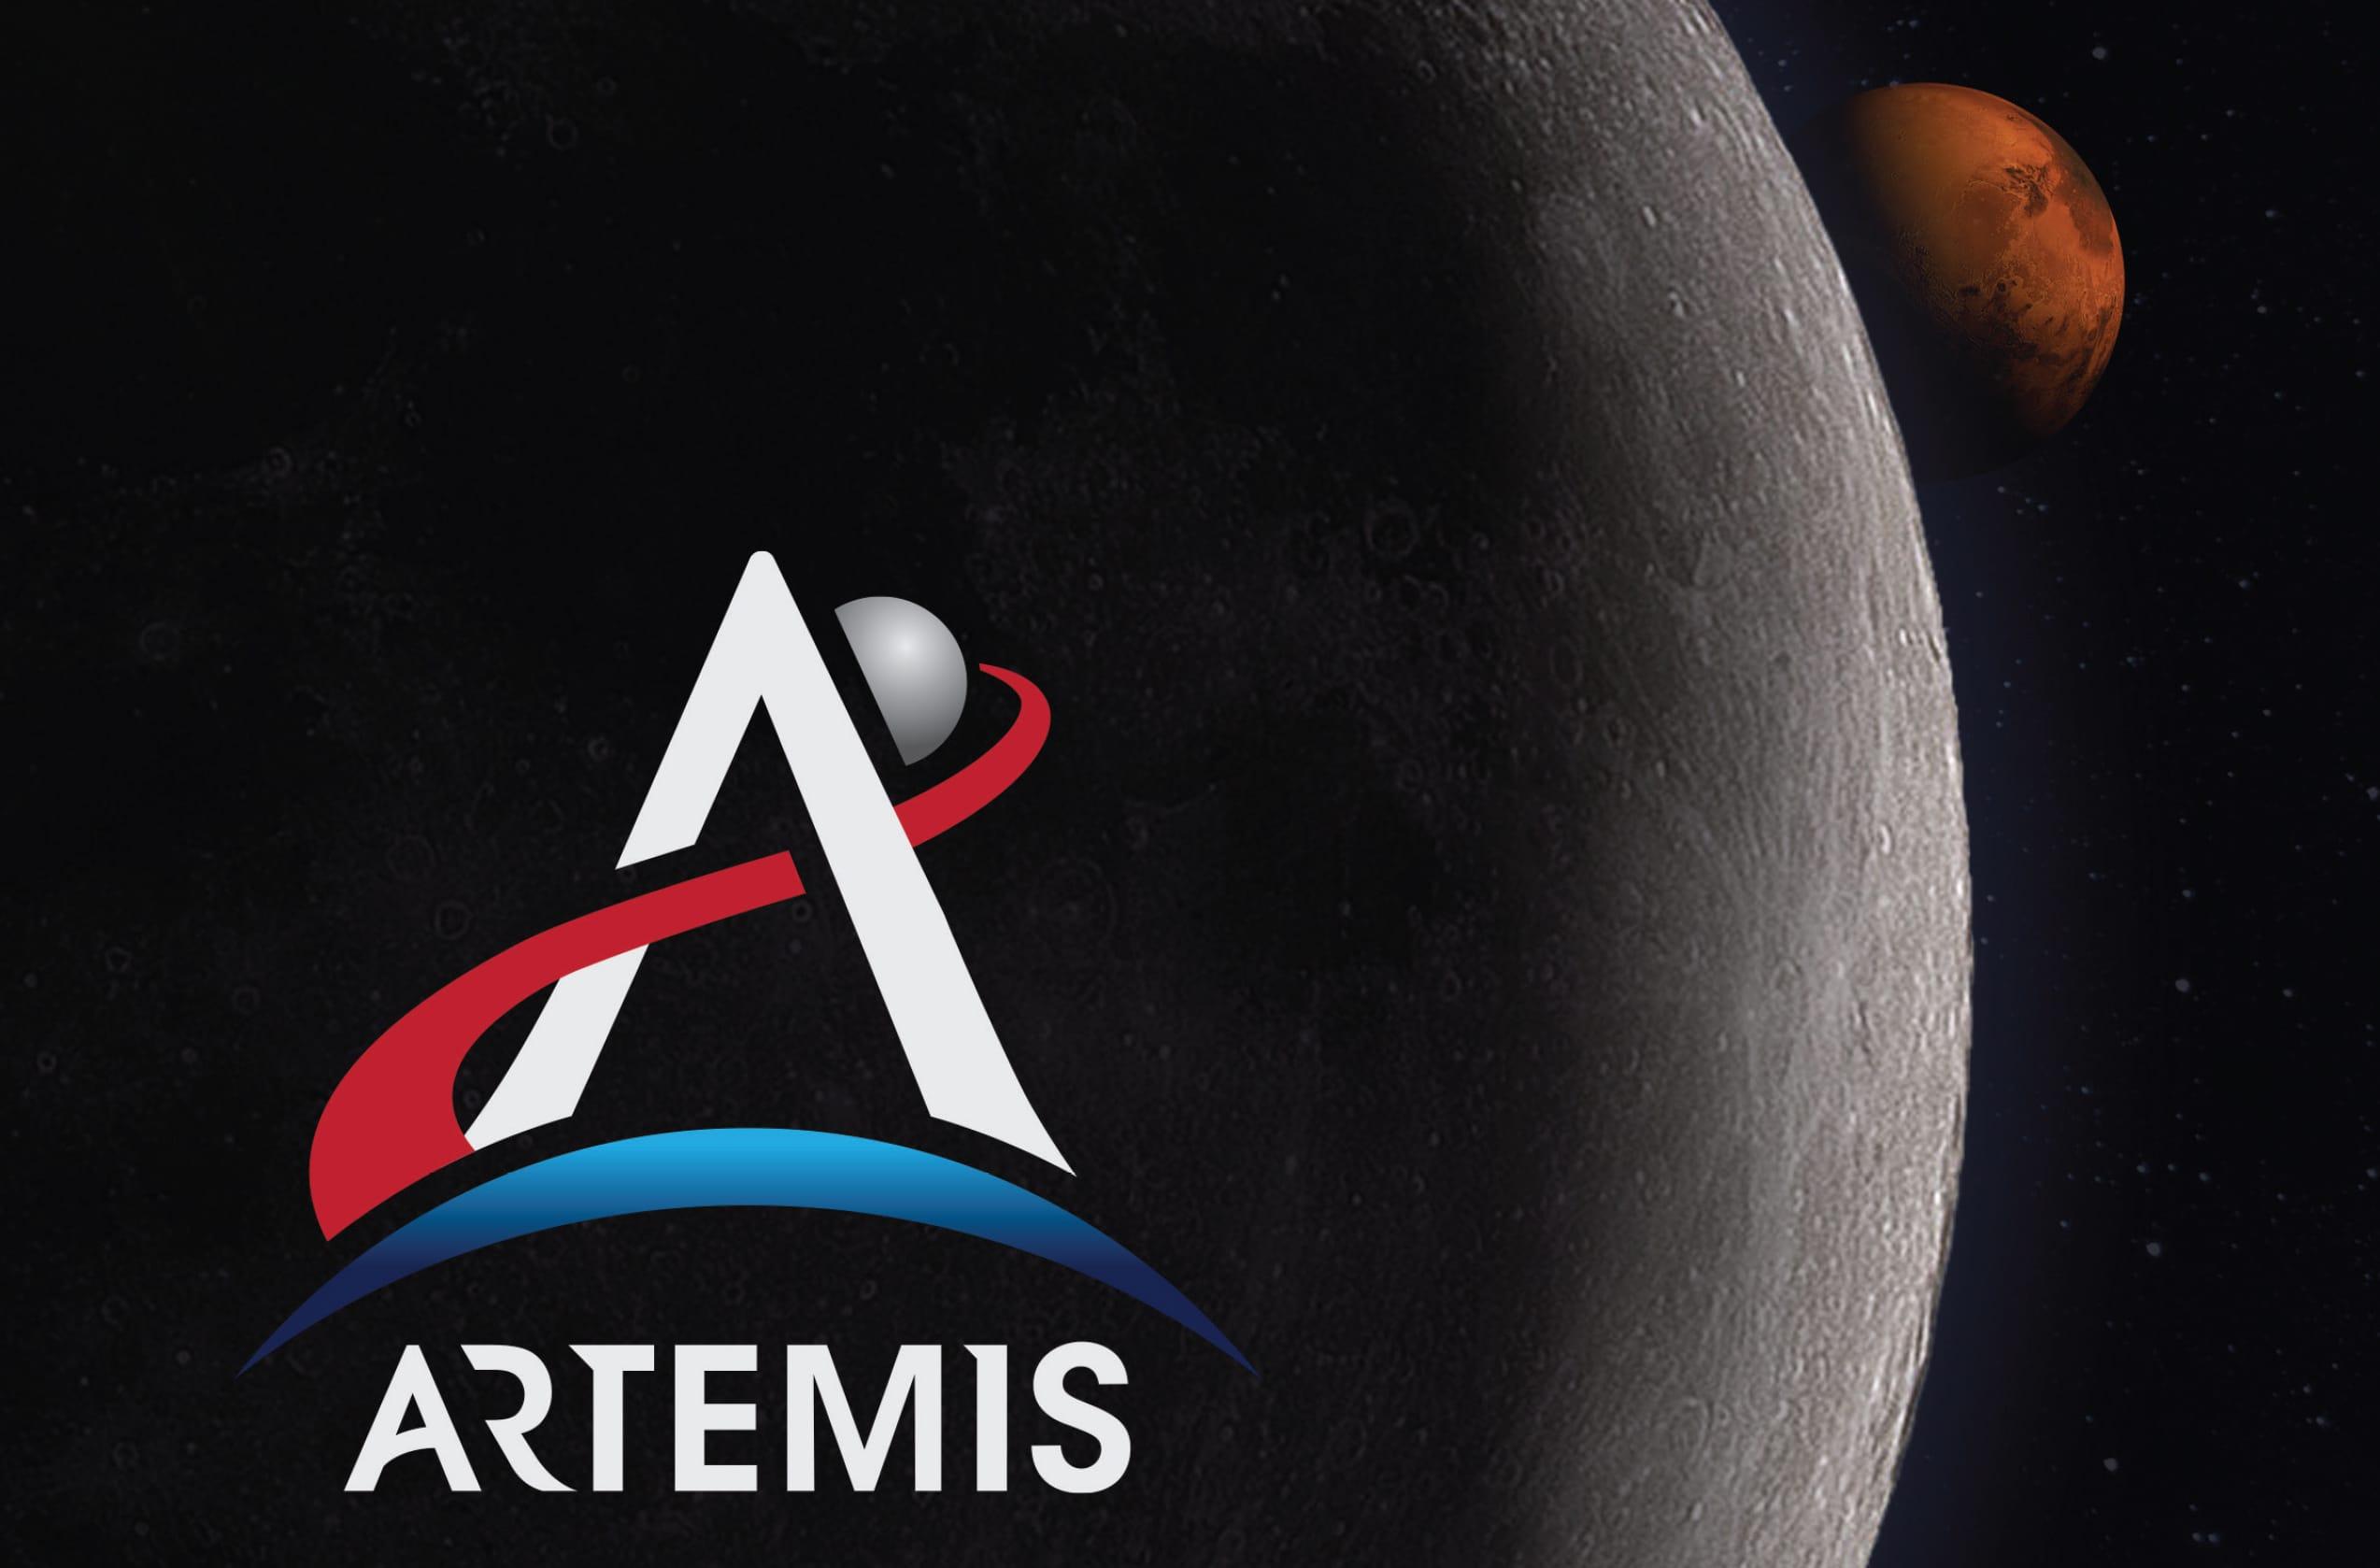 NASA Artimis Project